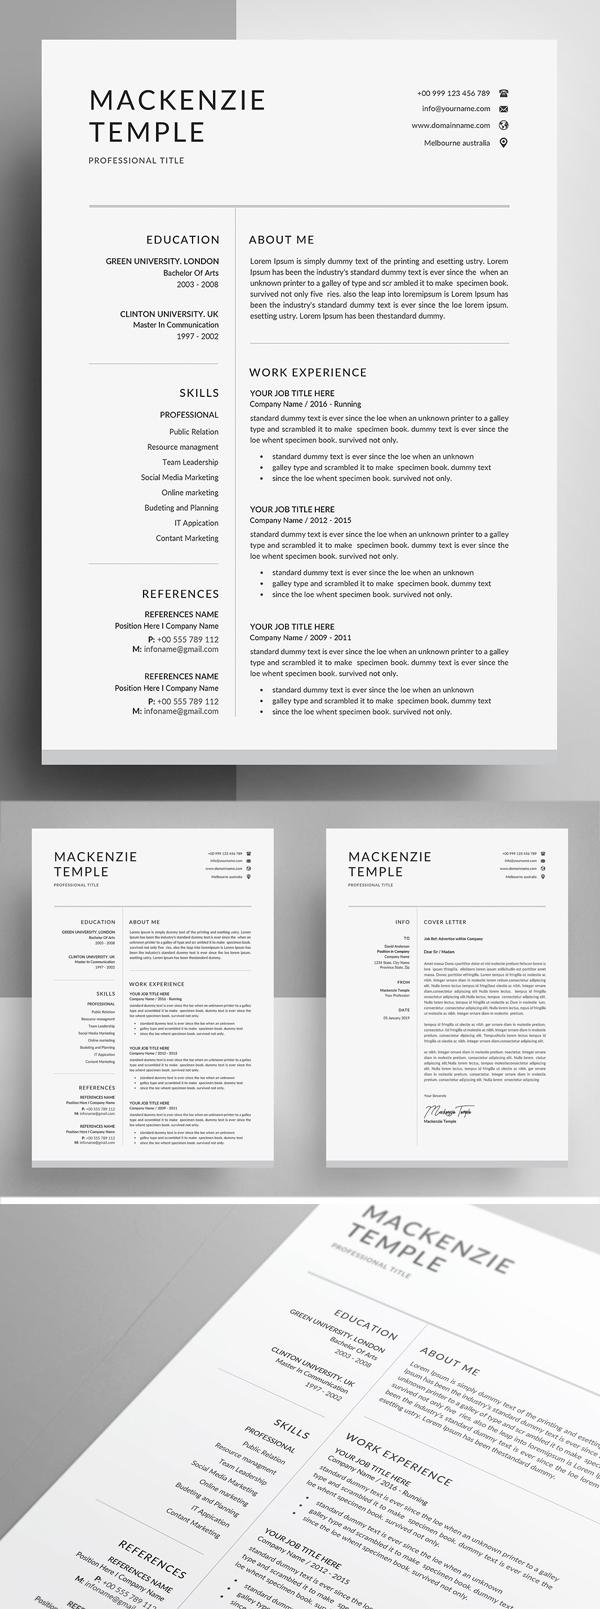 Attractive Resume Templates Free Download Google Docs